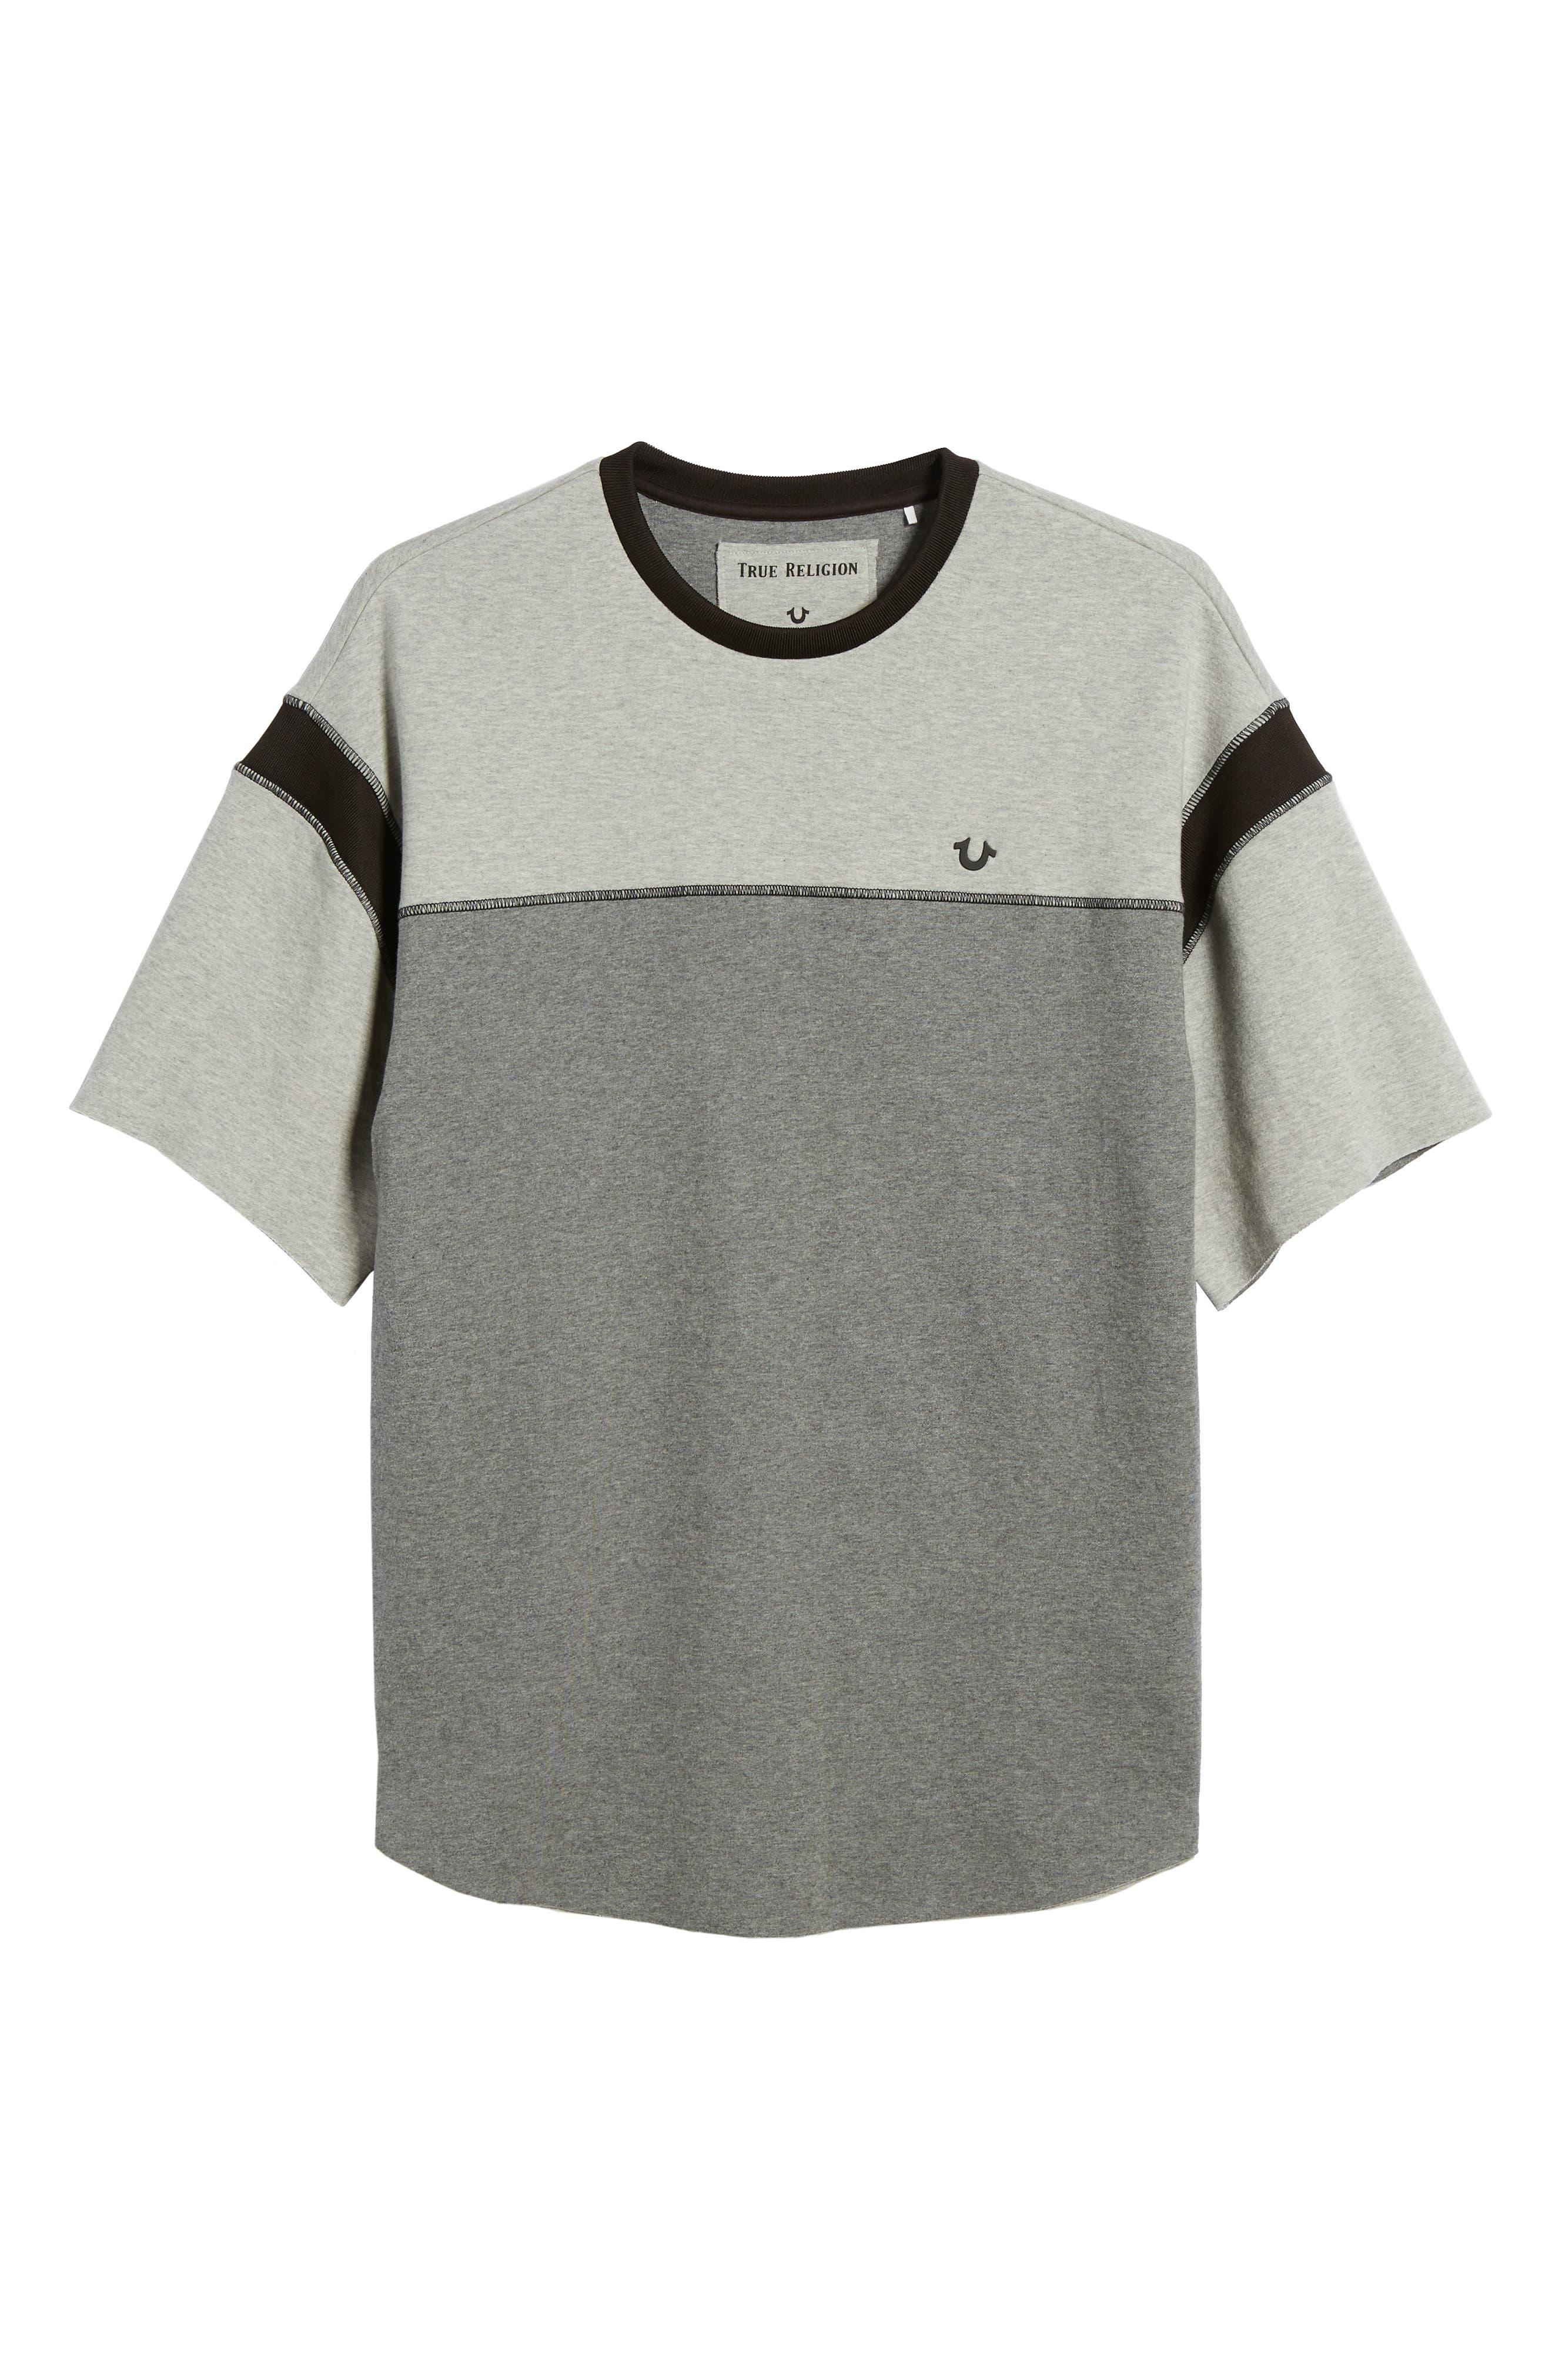 Football T-Shirt,                             Alternate thumbnail 6, color,                             020